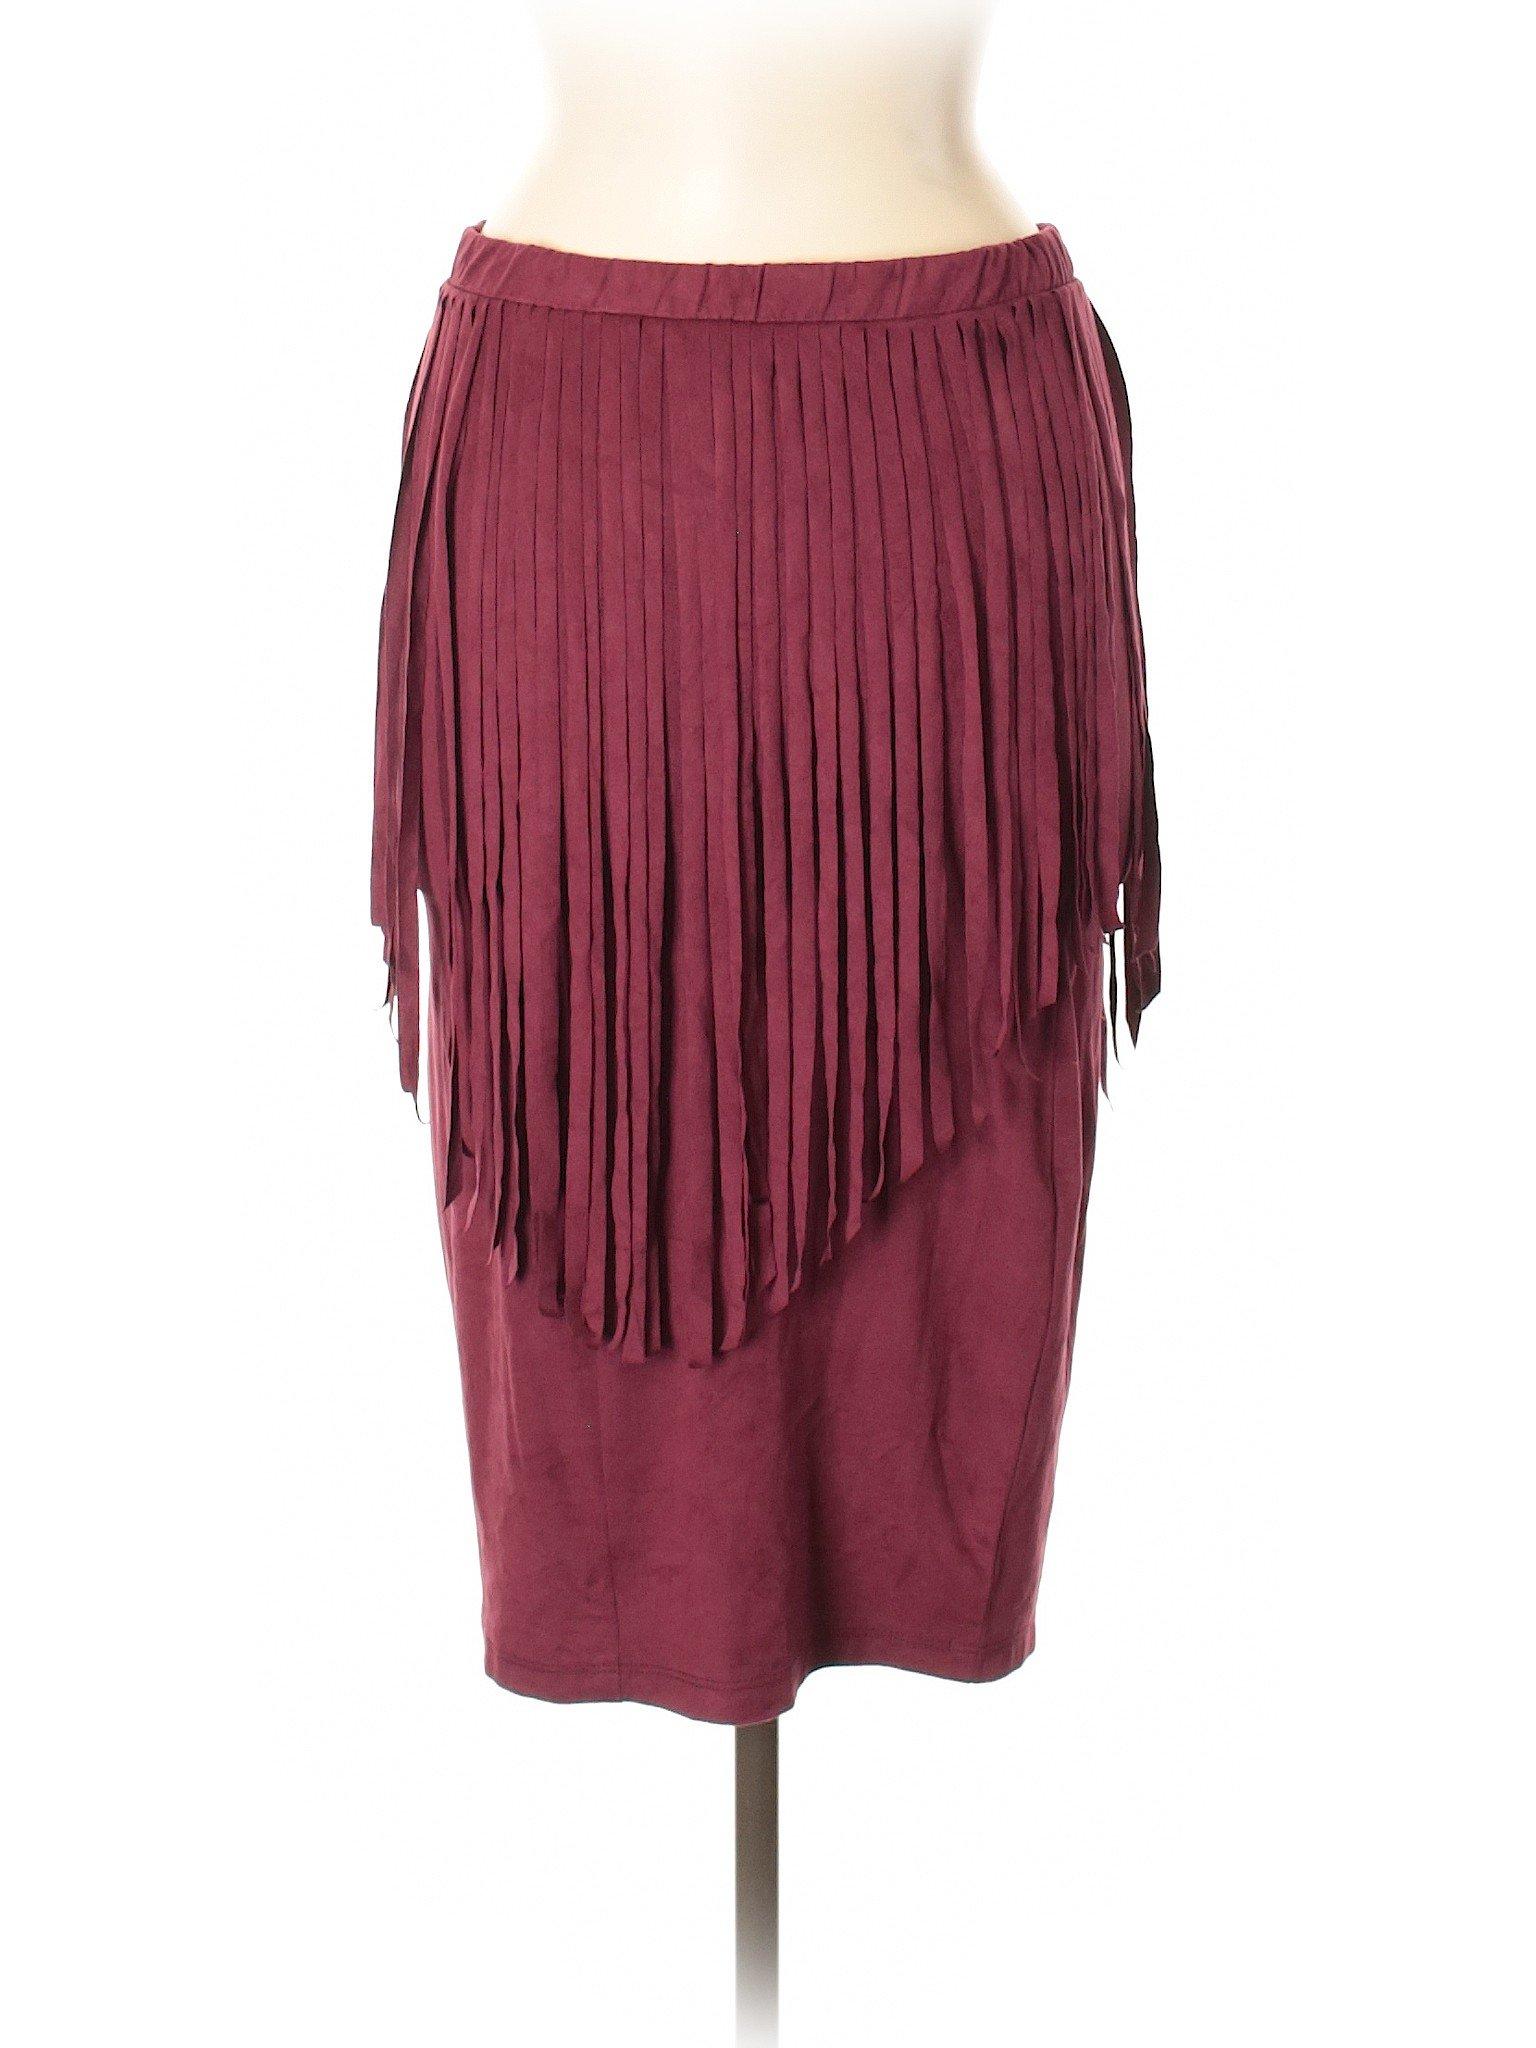 Boutique U leisure Formal Skirt M I Vibrant r6rnPFg